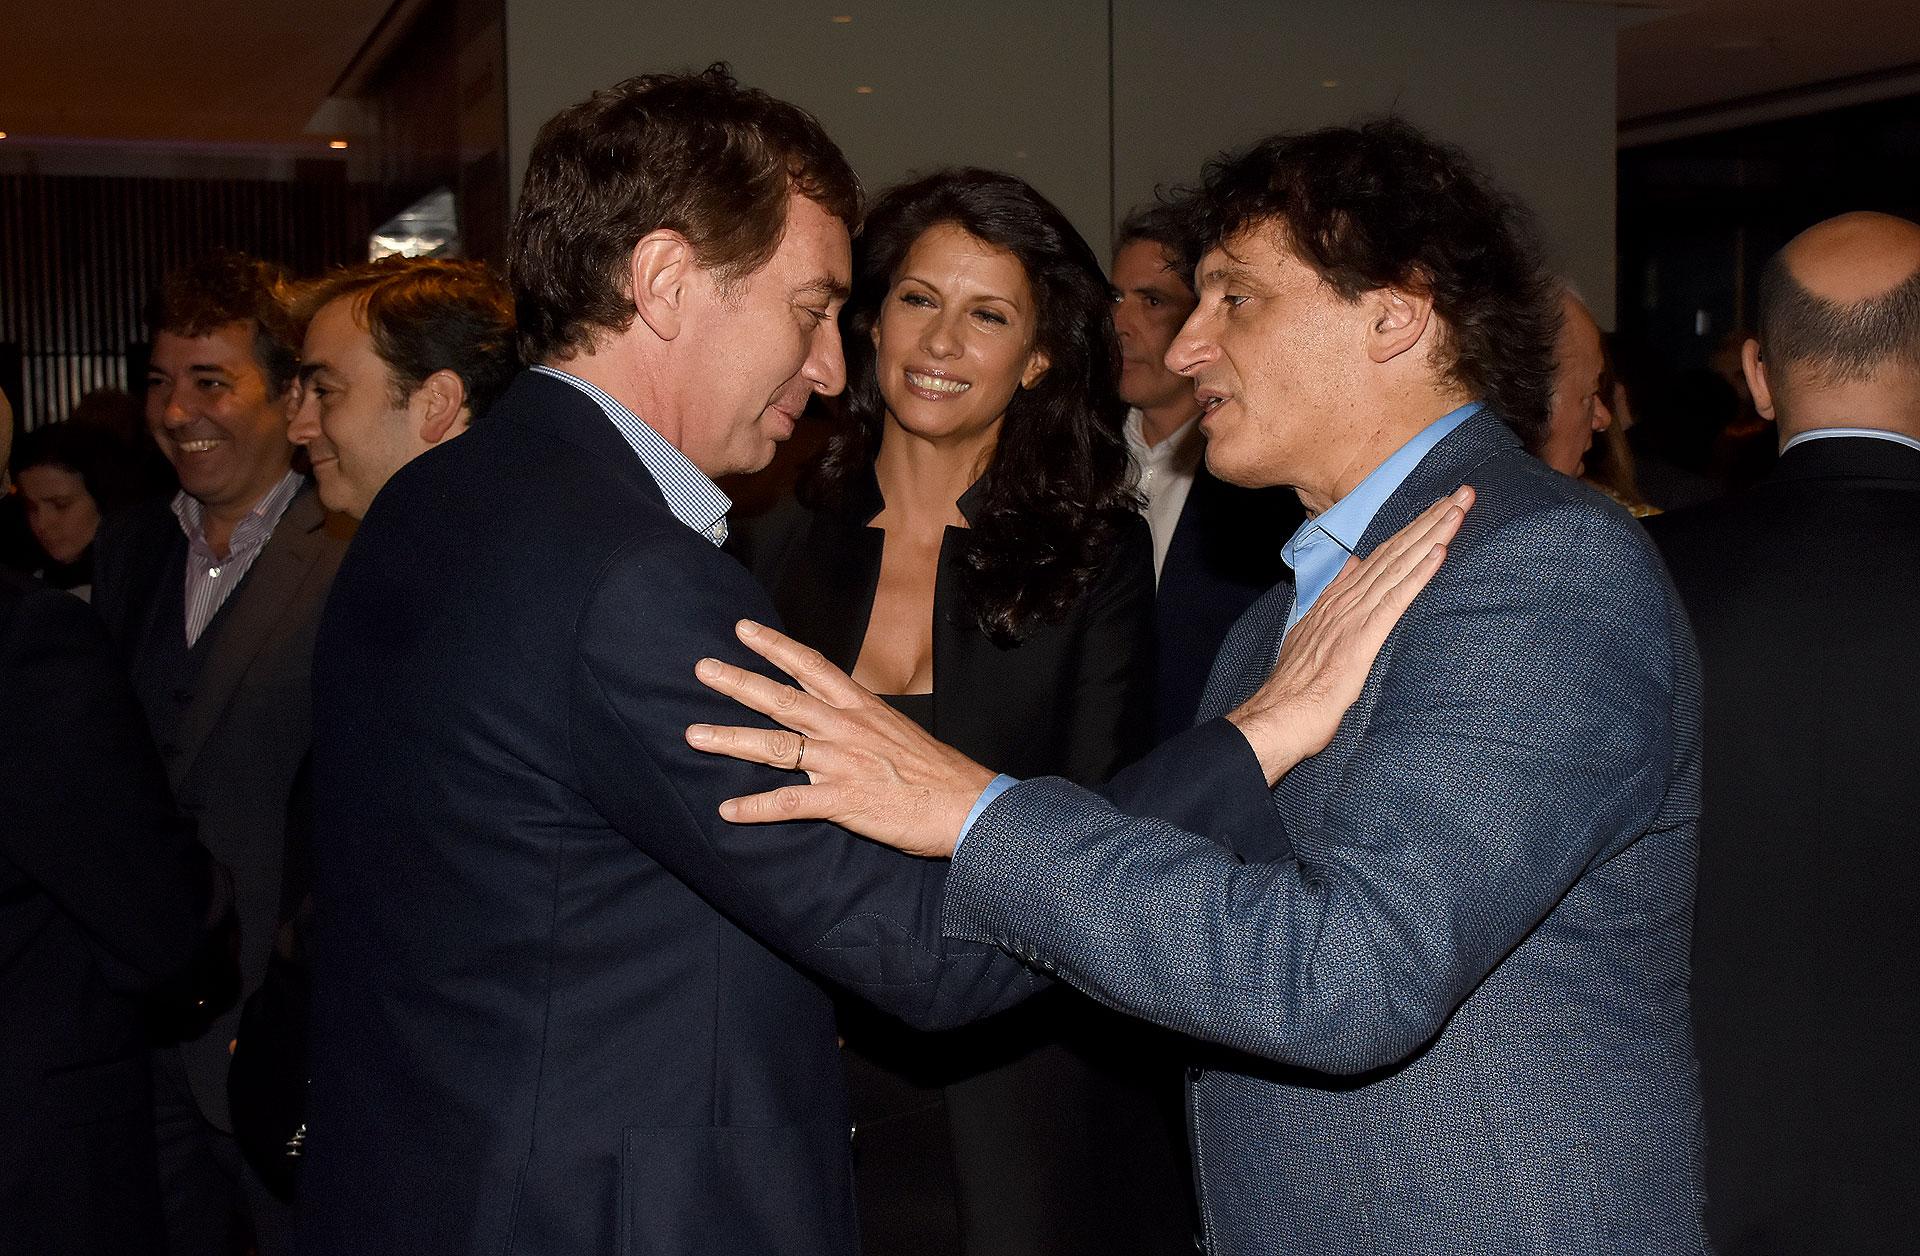 Diego Santilli, Analía Maiorana y Ángel Mahler